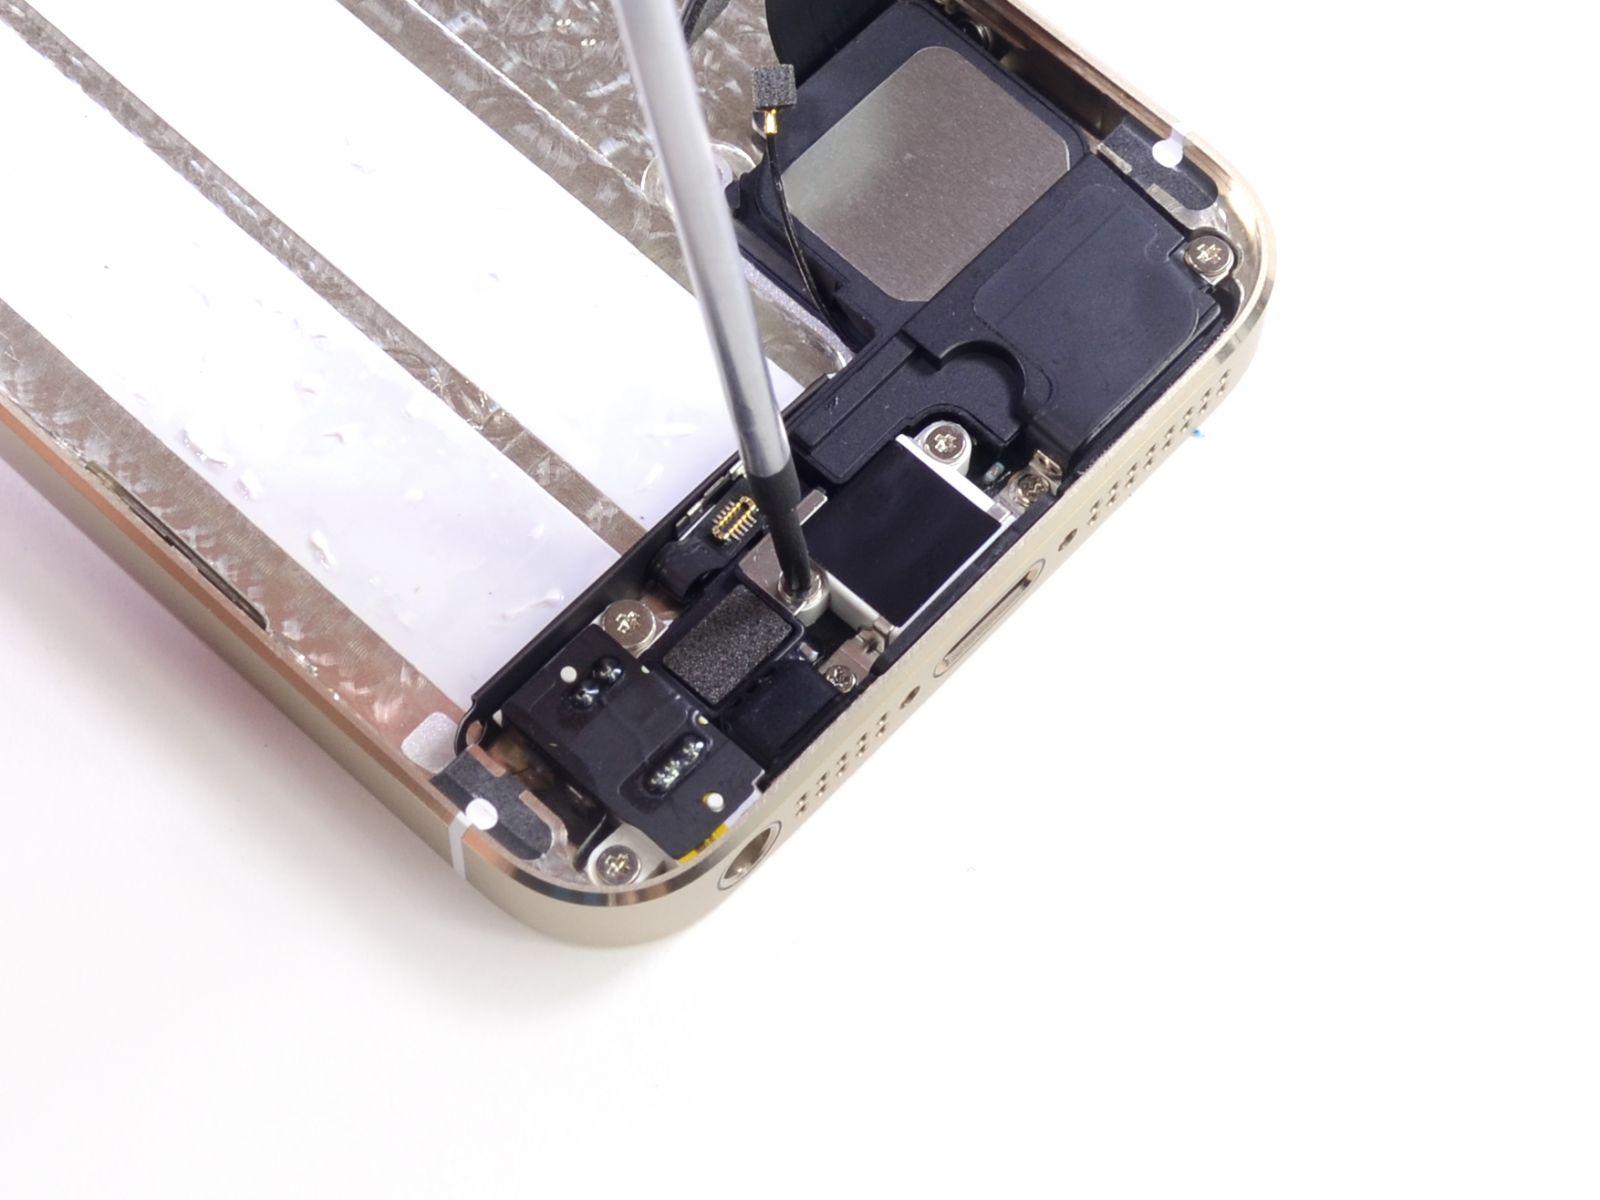 kak-razobrat-iphone-5s-41